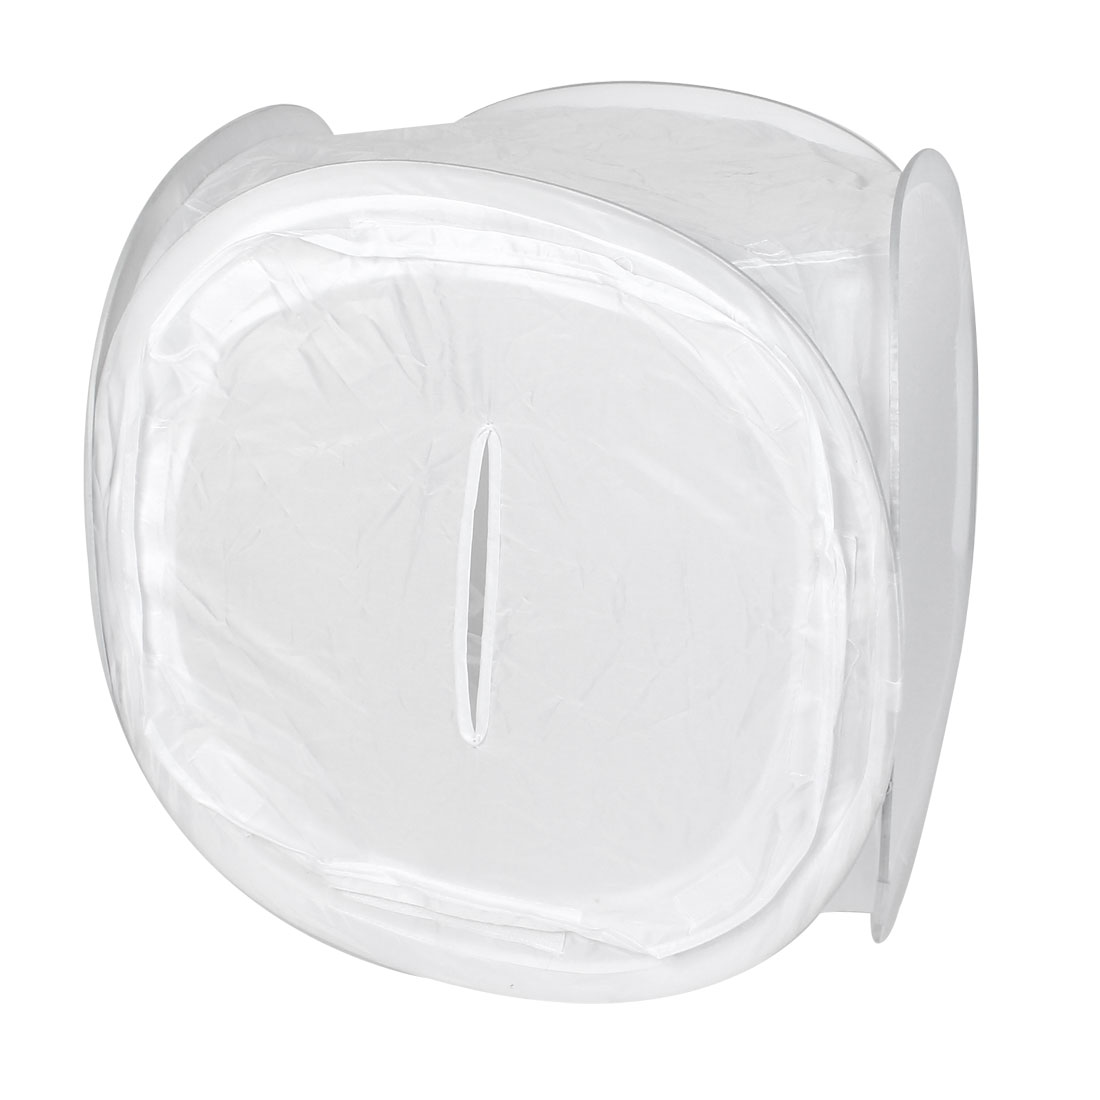 "White Flash Softbox Diffuser 50cm x 50cm 20"" for Digital SLR Camera"